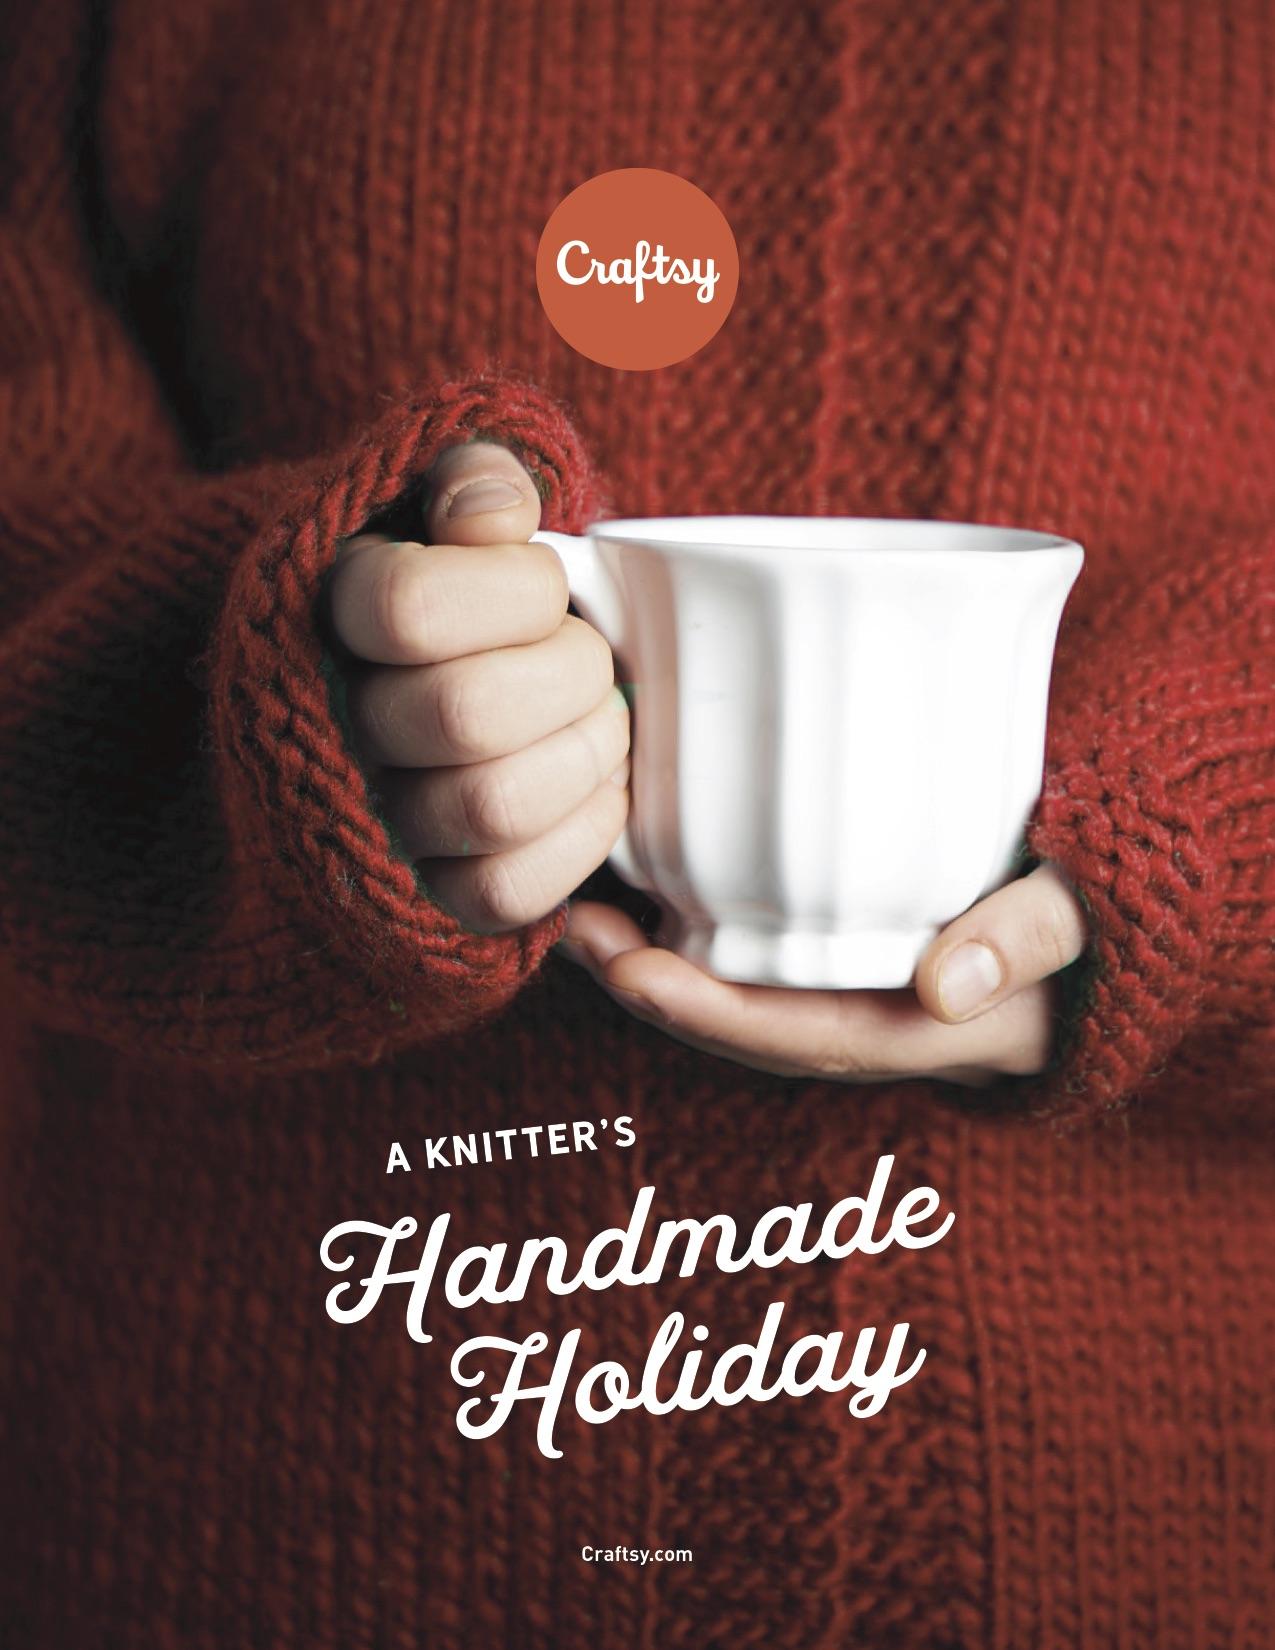 A Knitter's Handmade Holiday on Bluprint